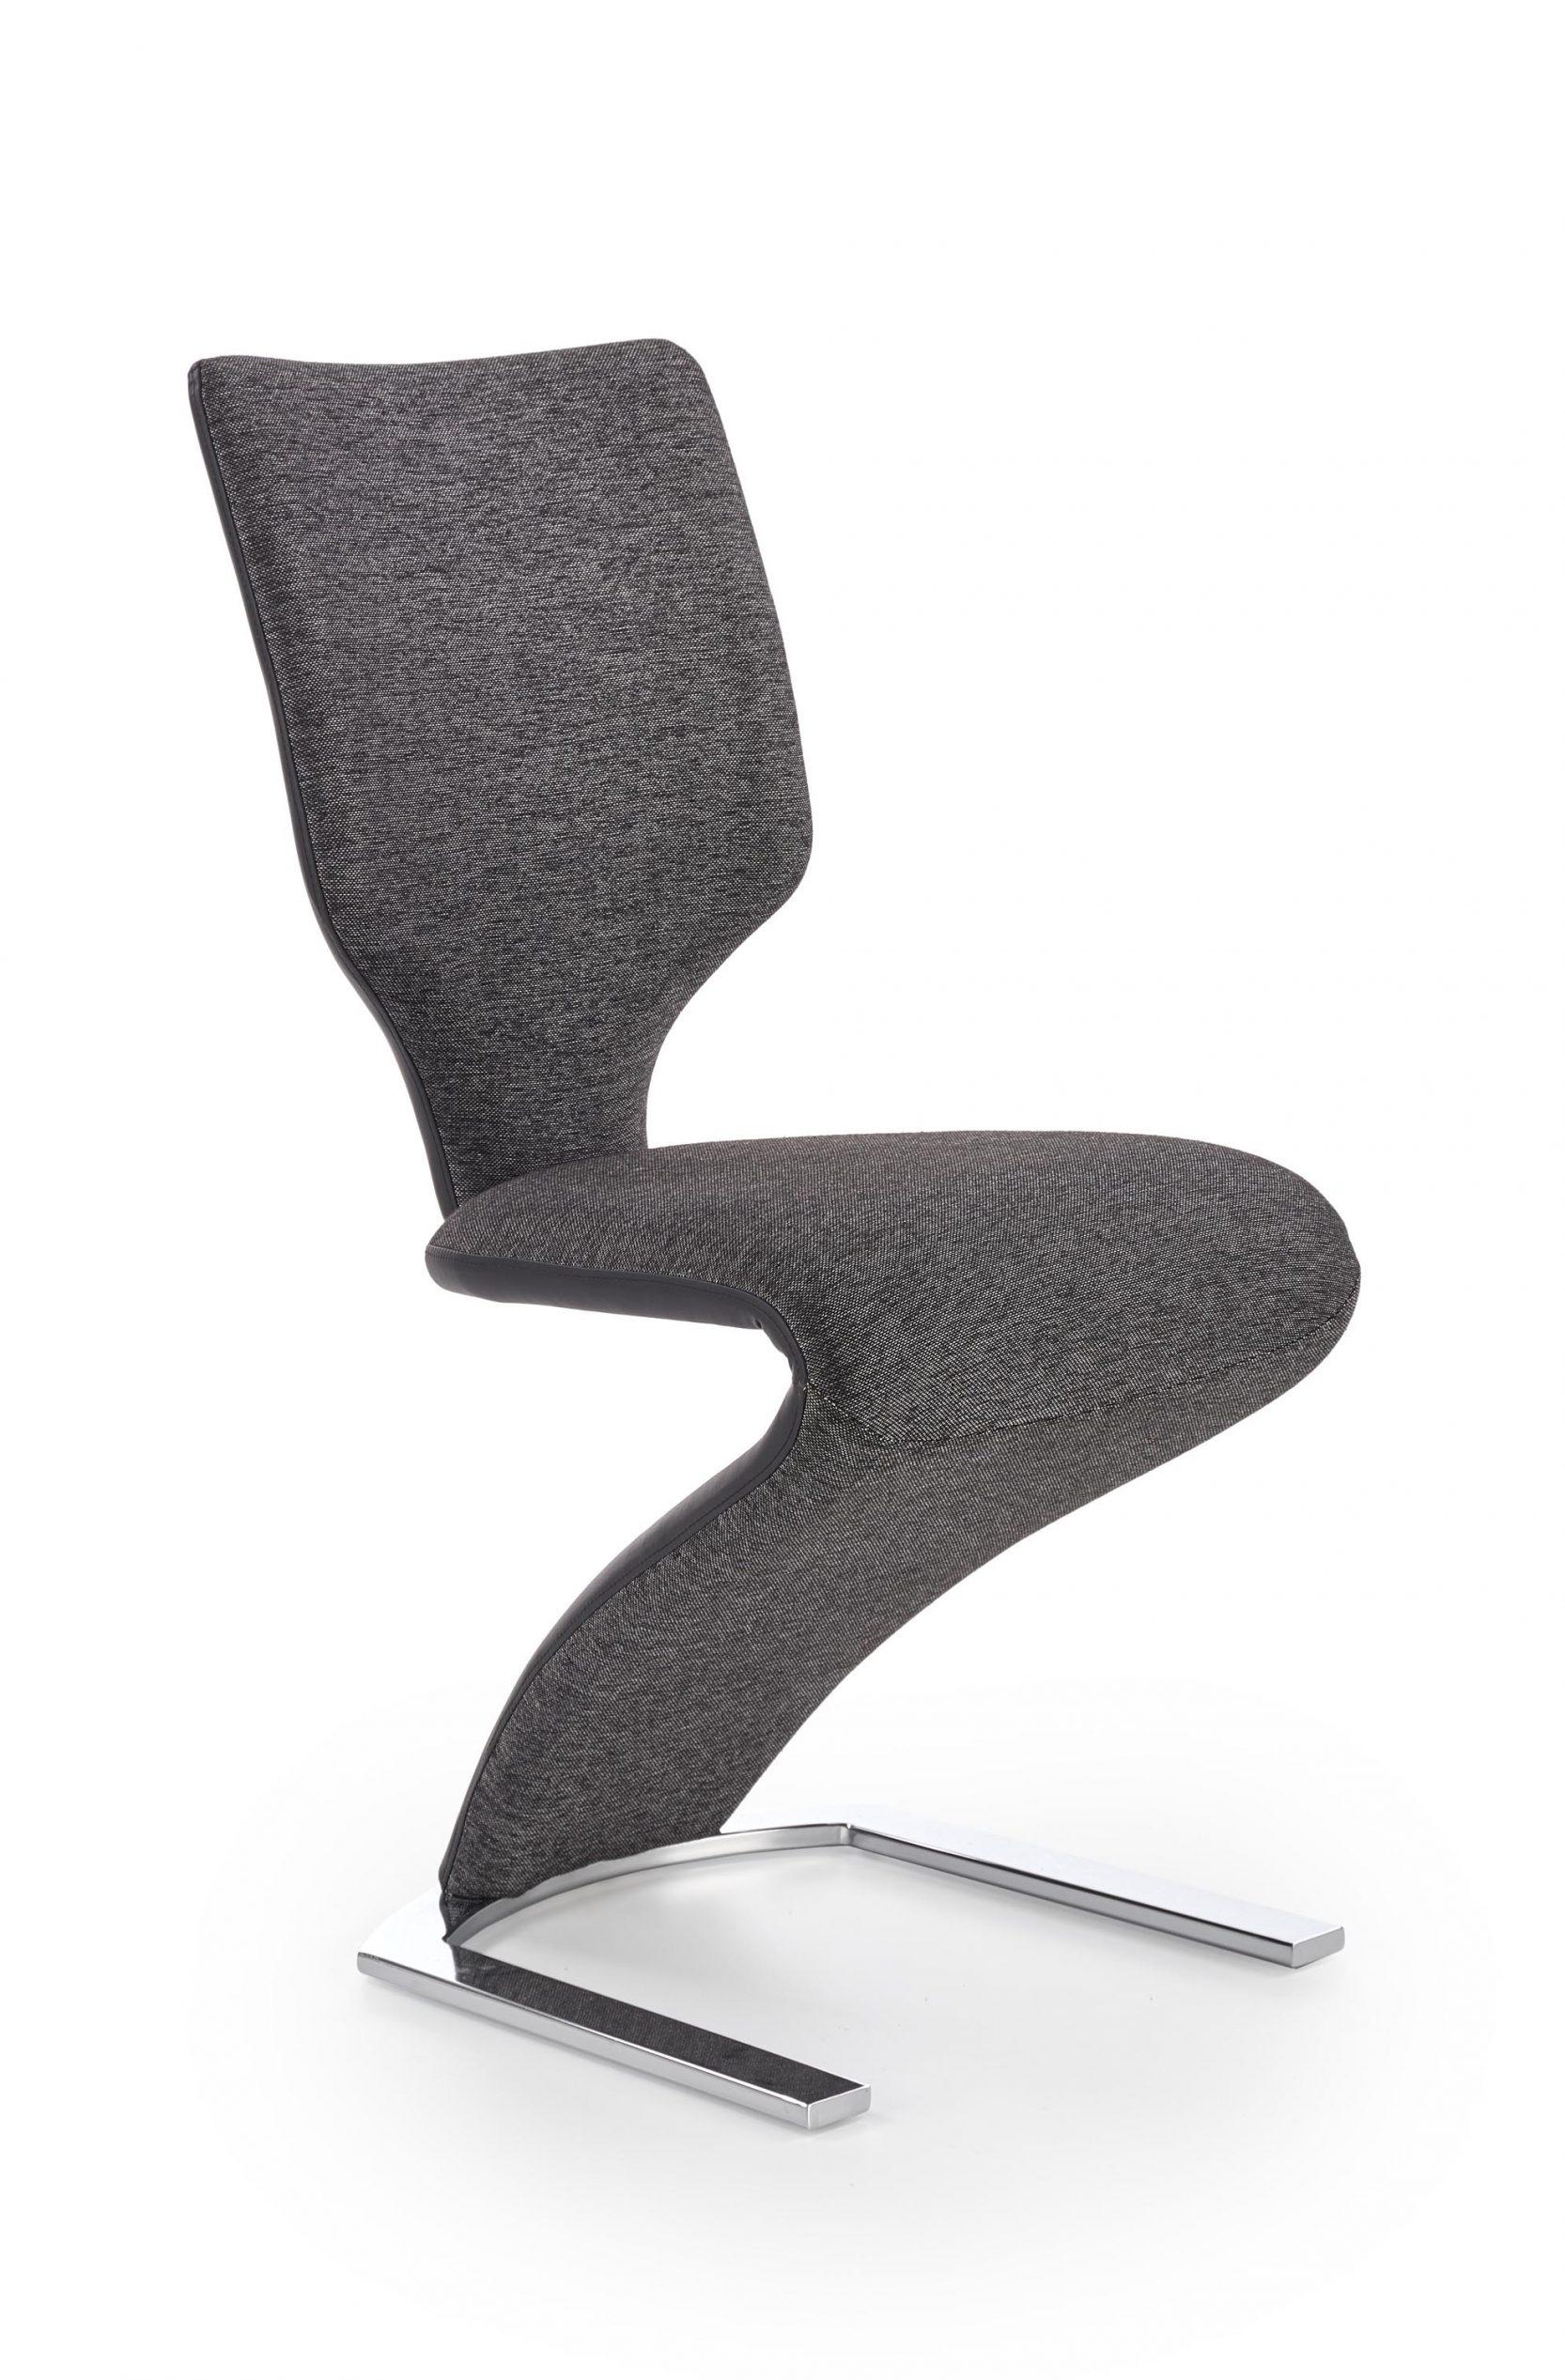 Scaun tapitat cu stofa si piele ecologica, cu picioare metalice K307 Gri inchis / Negru l46xA62xH95 cm imagine